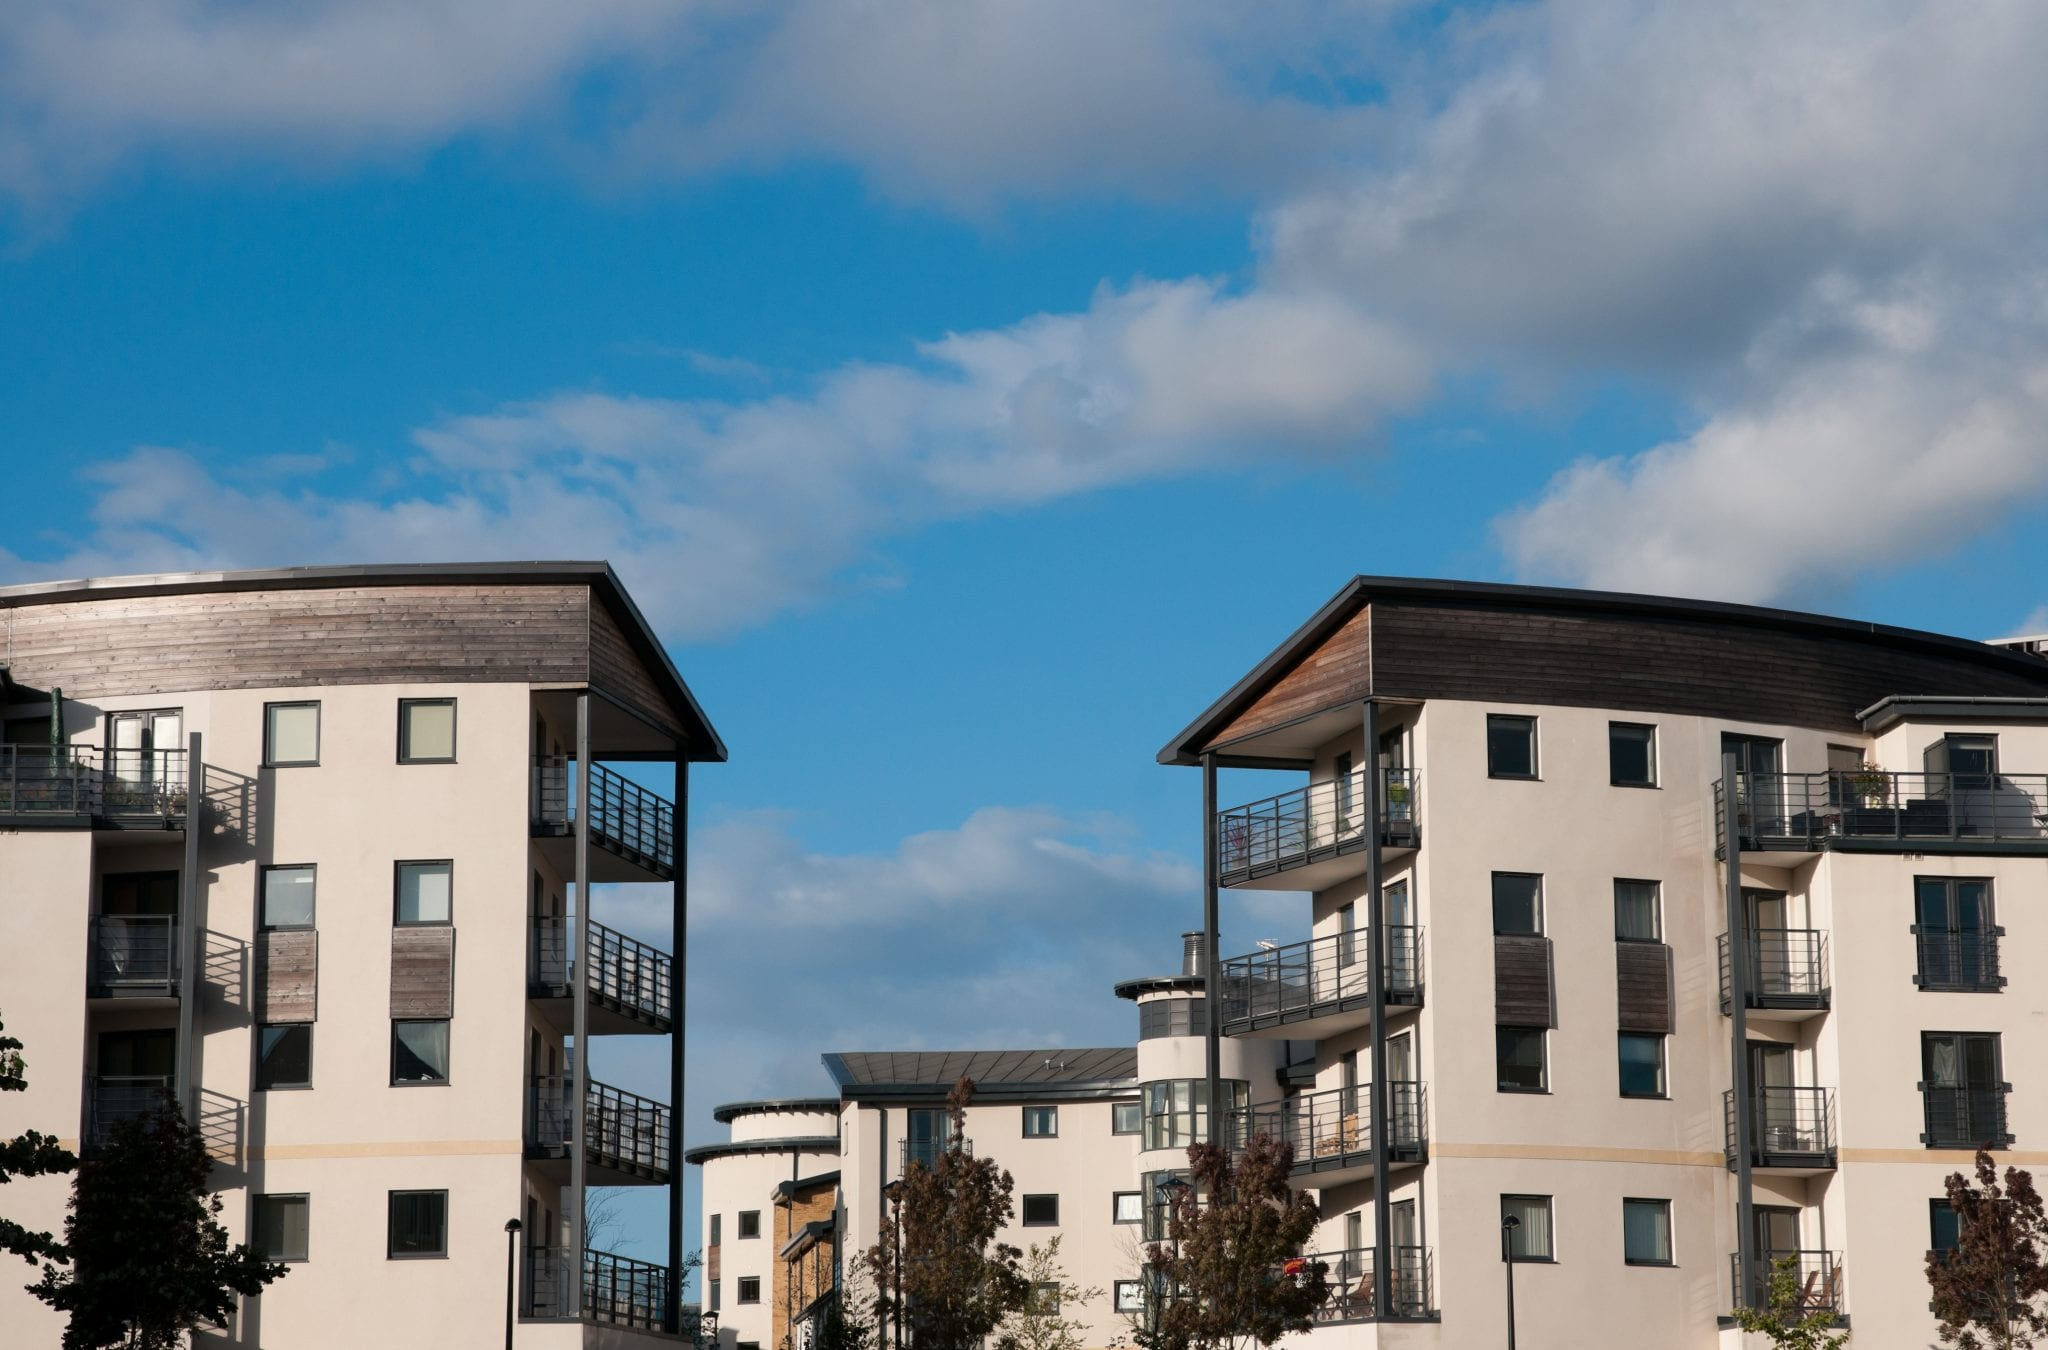 Modern Communal Blocks with blue sky background